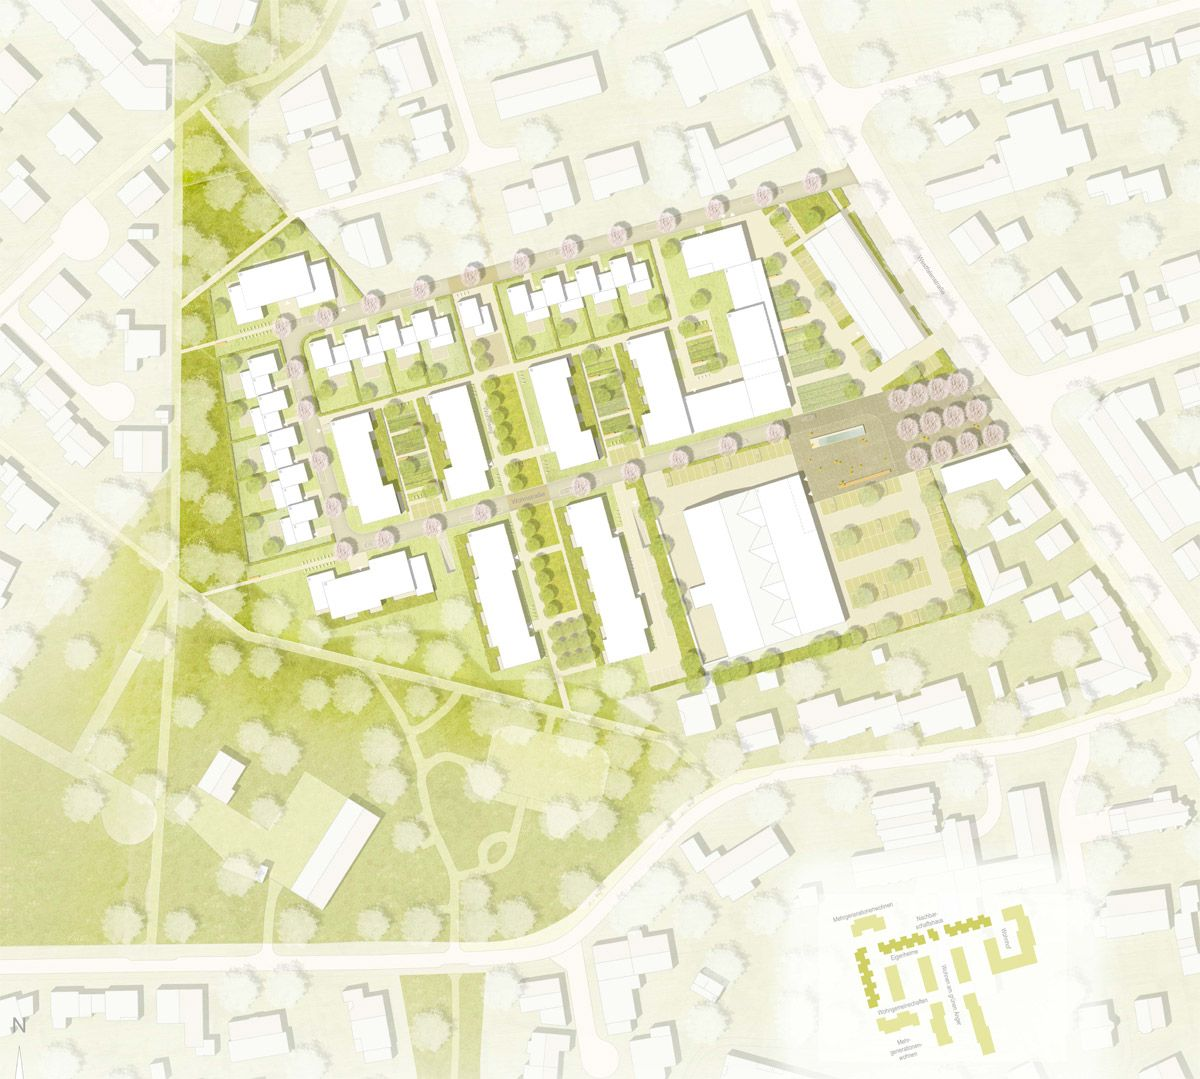 2 preis architektur pinterest for Architektur design studium